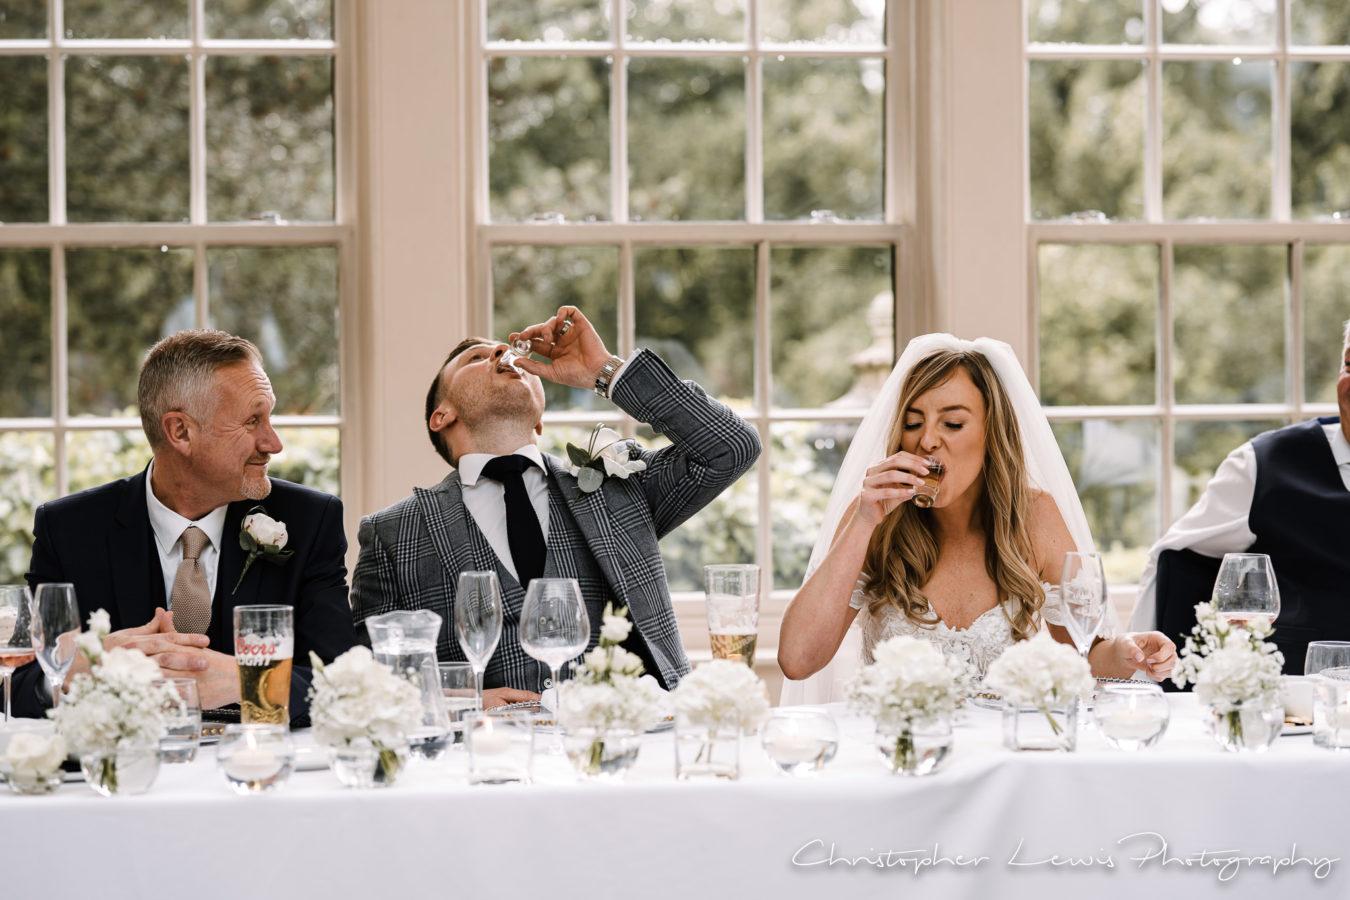 Mitton-Hall-Wedding 52